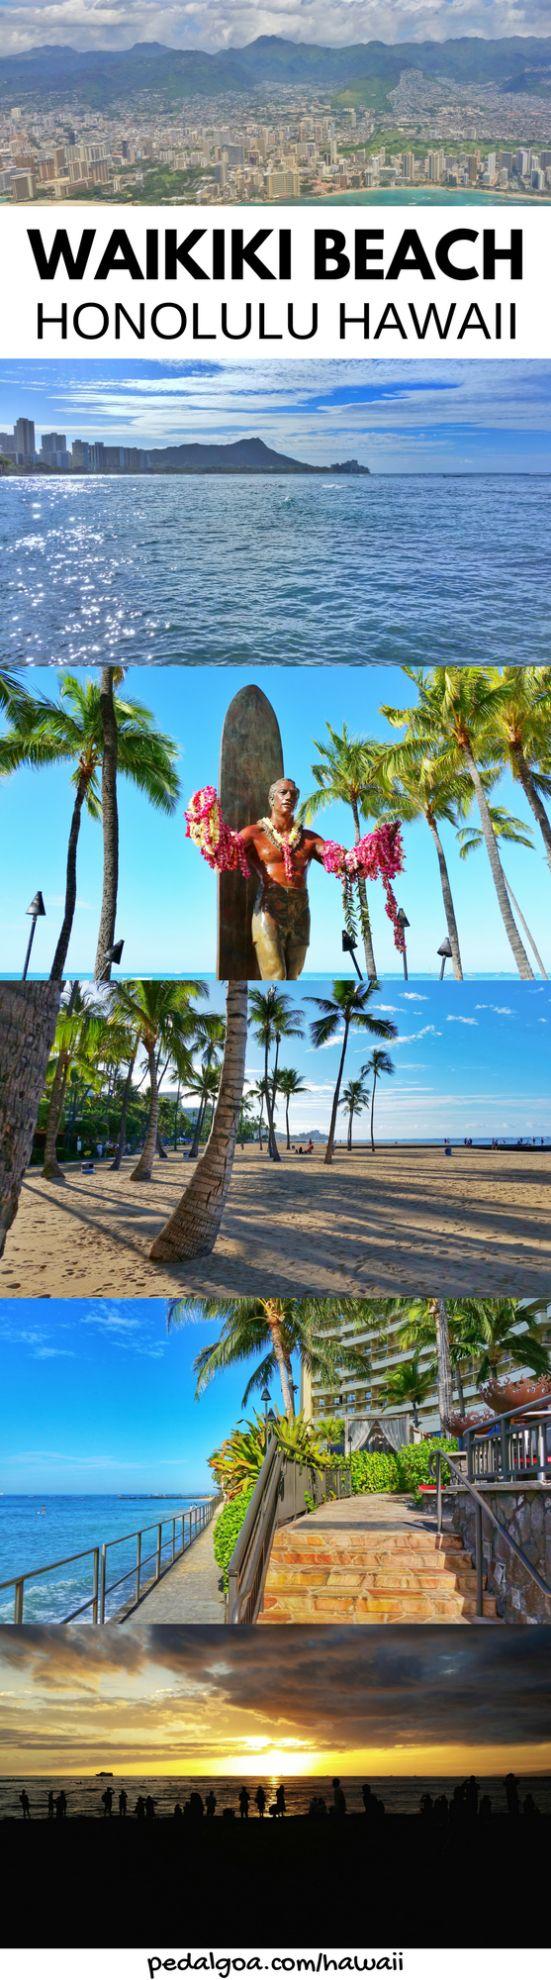 Waikiki Beach (Honolulu) - 2019 All You Need to Know ...